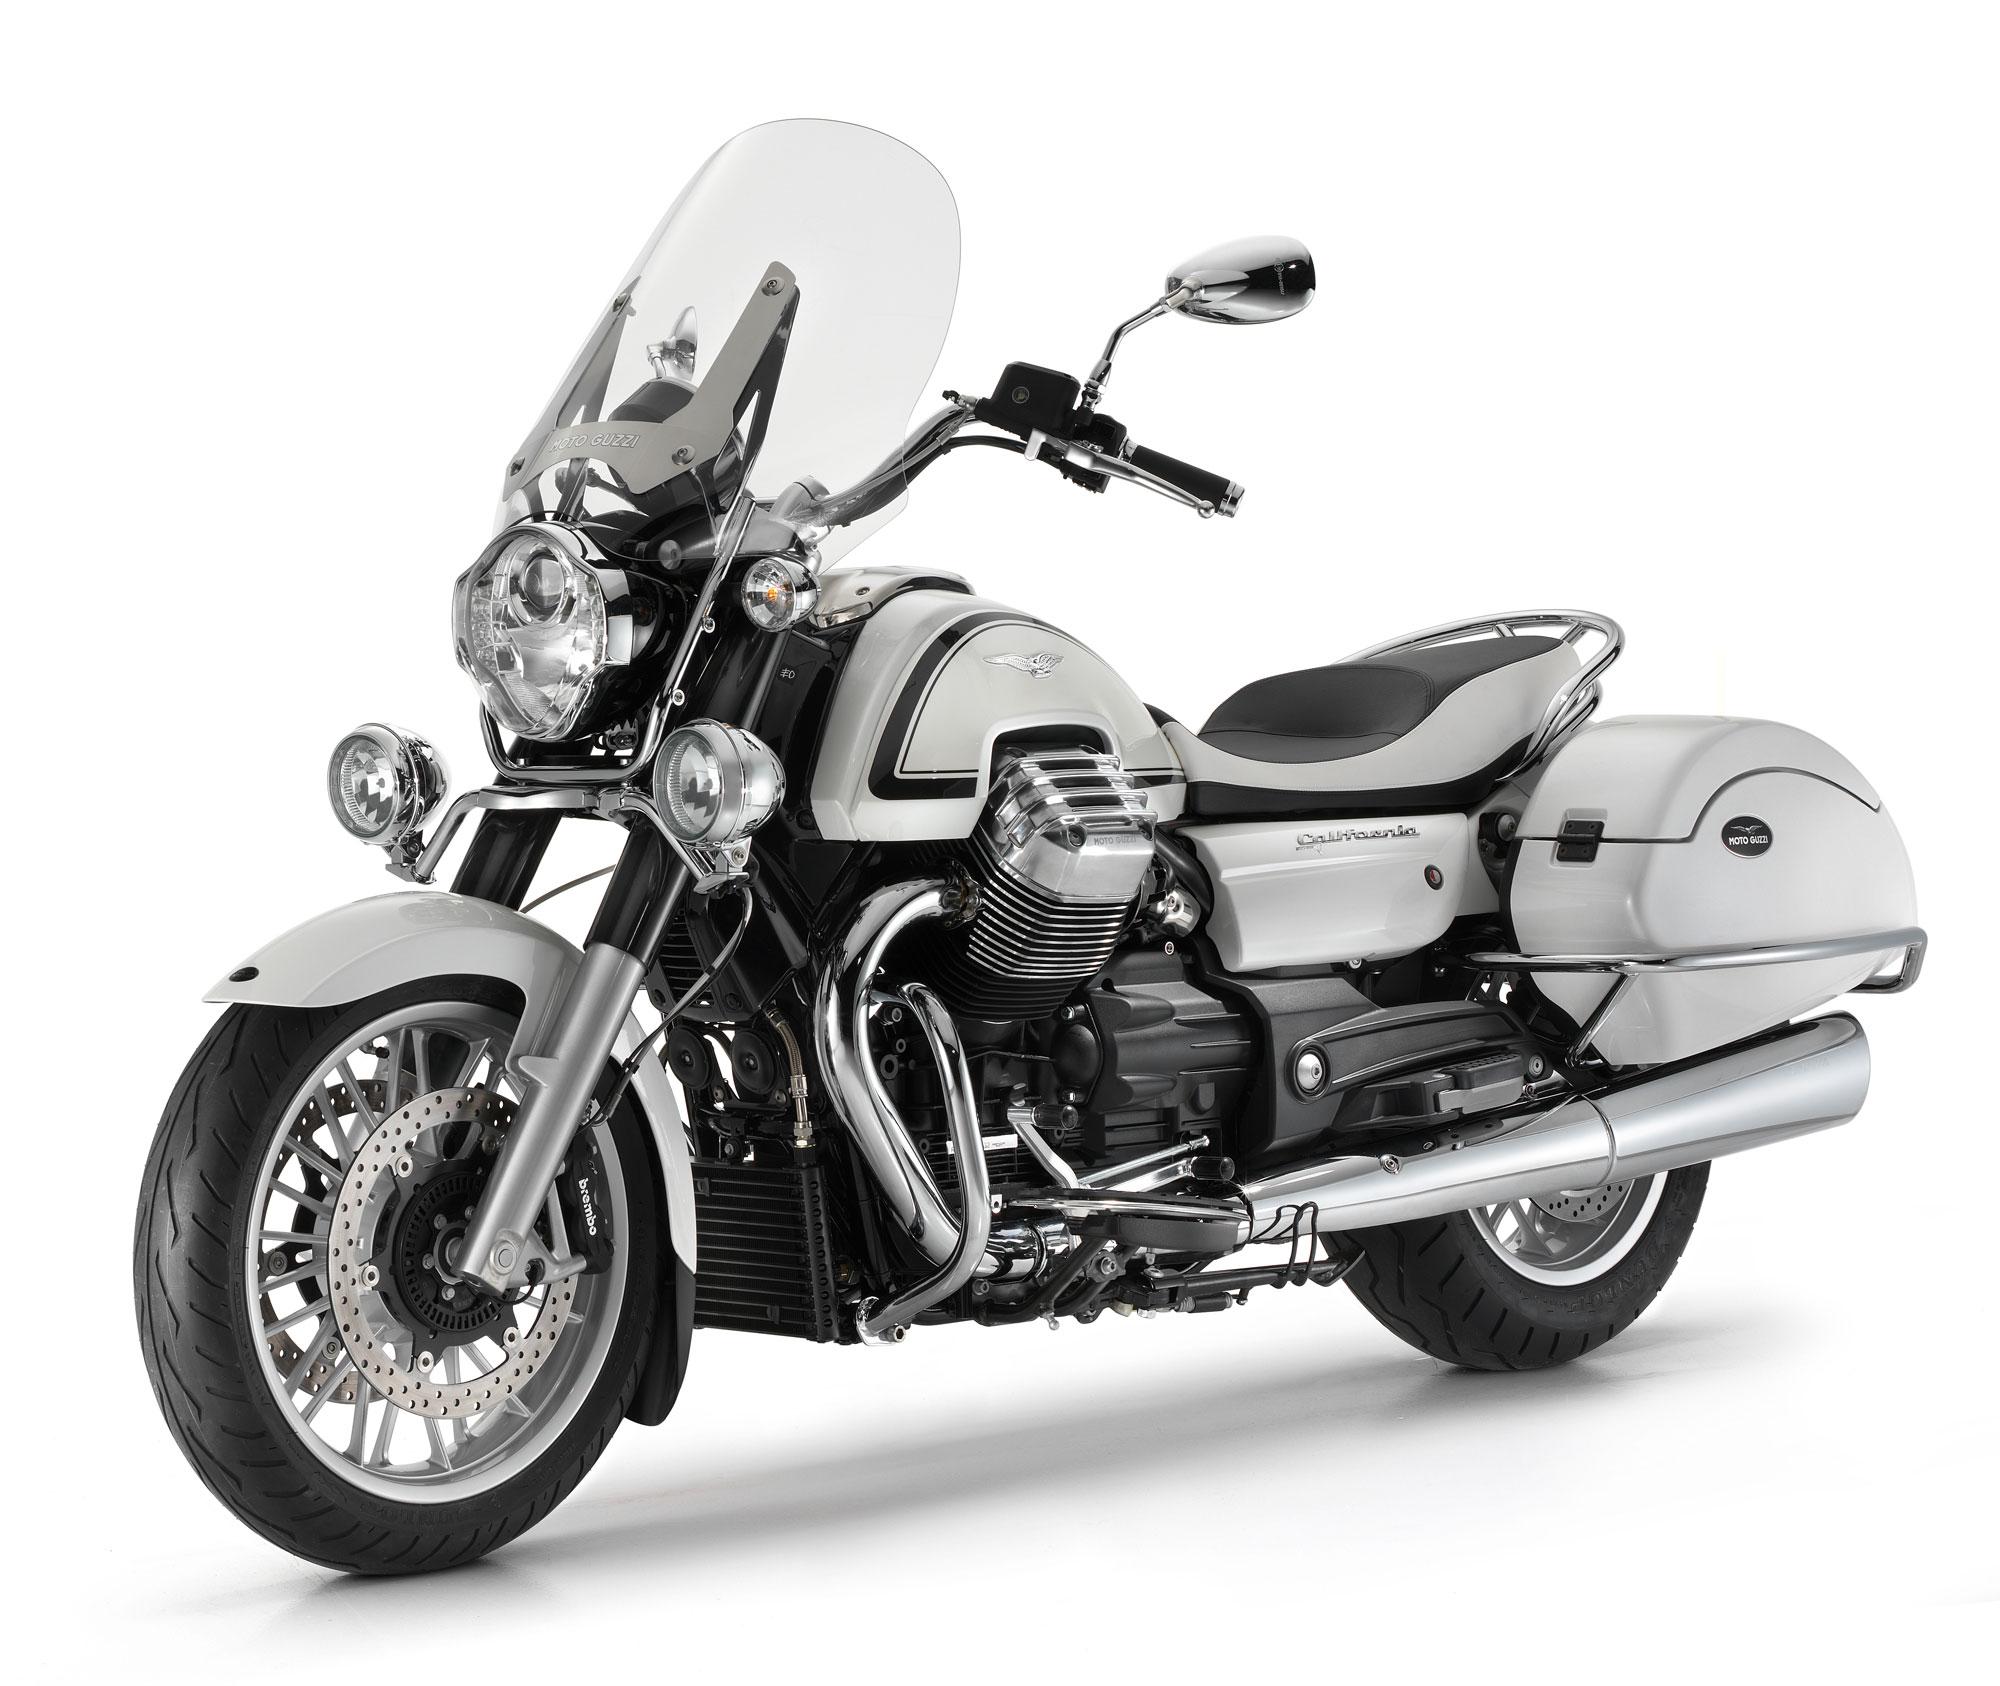 moto guzzi california 1400 touring 2012 2013 autoevolution. Black Bedroom Furniture Sets. Home Design Ideas